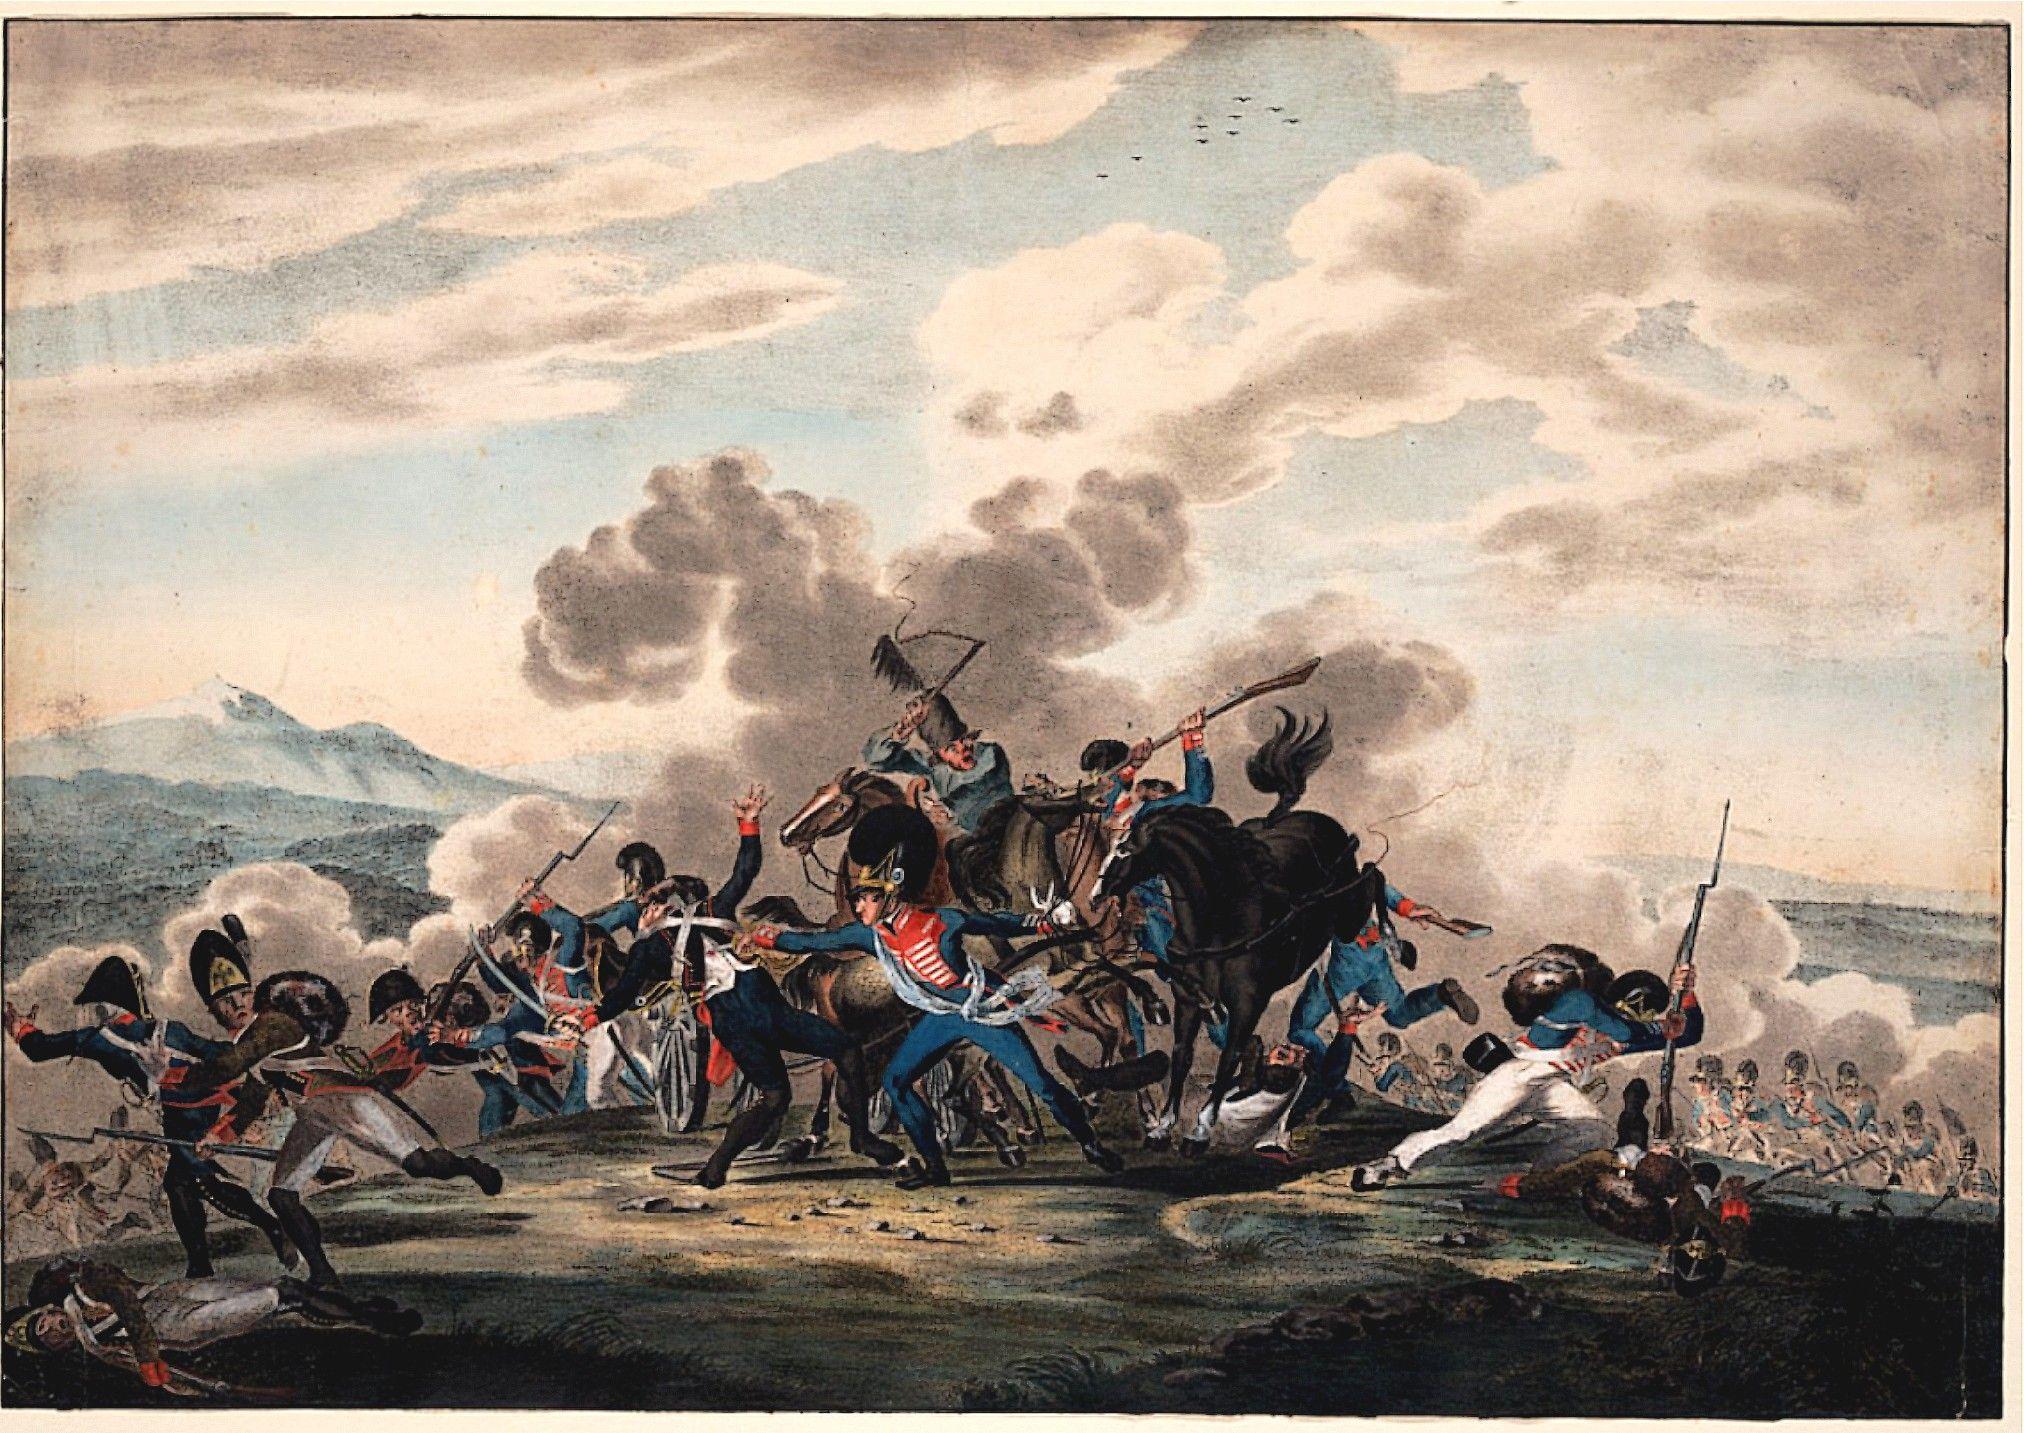 Bavarian King's regiment in battle- 1807